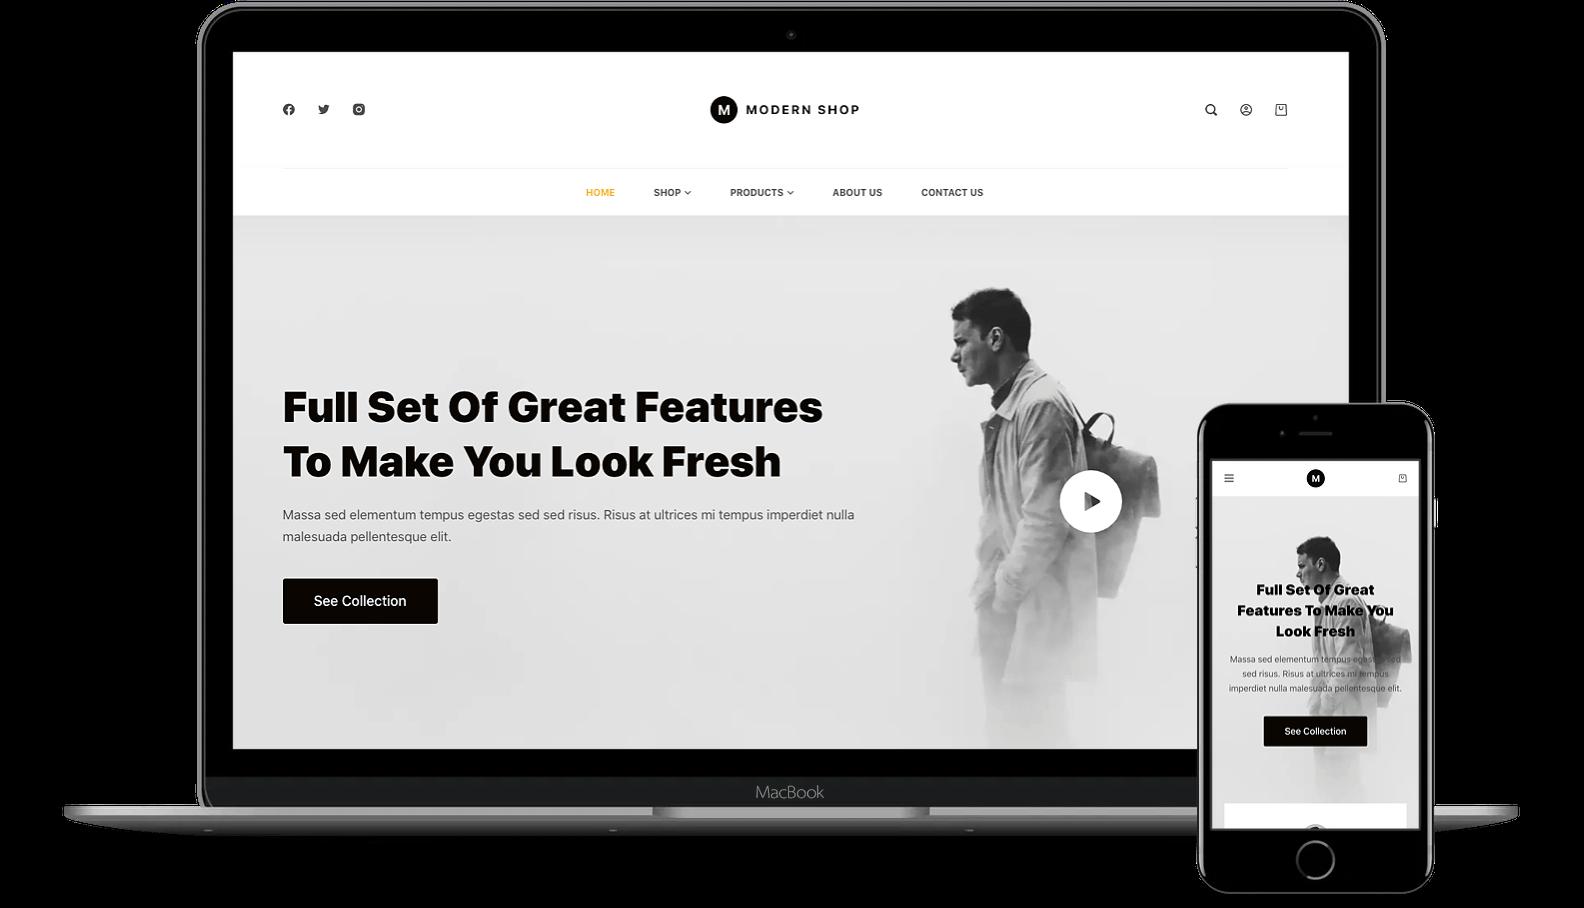 Blocksy on desktop and mobile